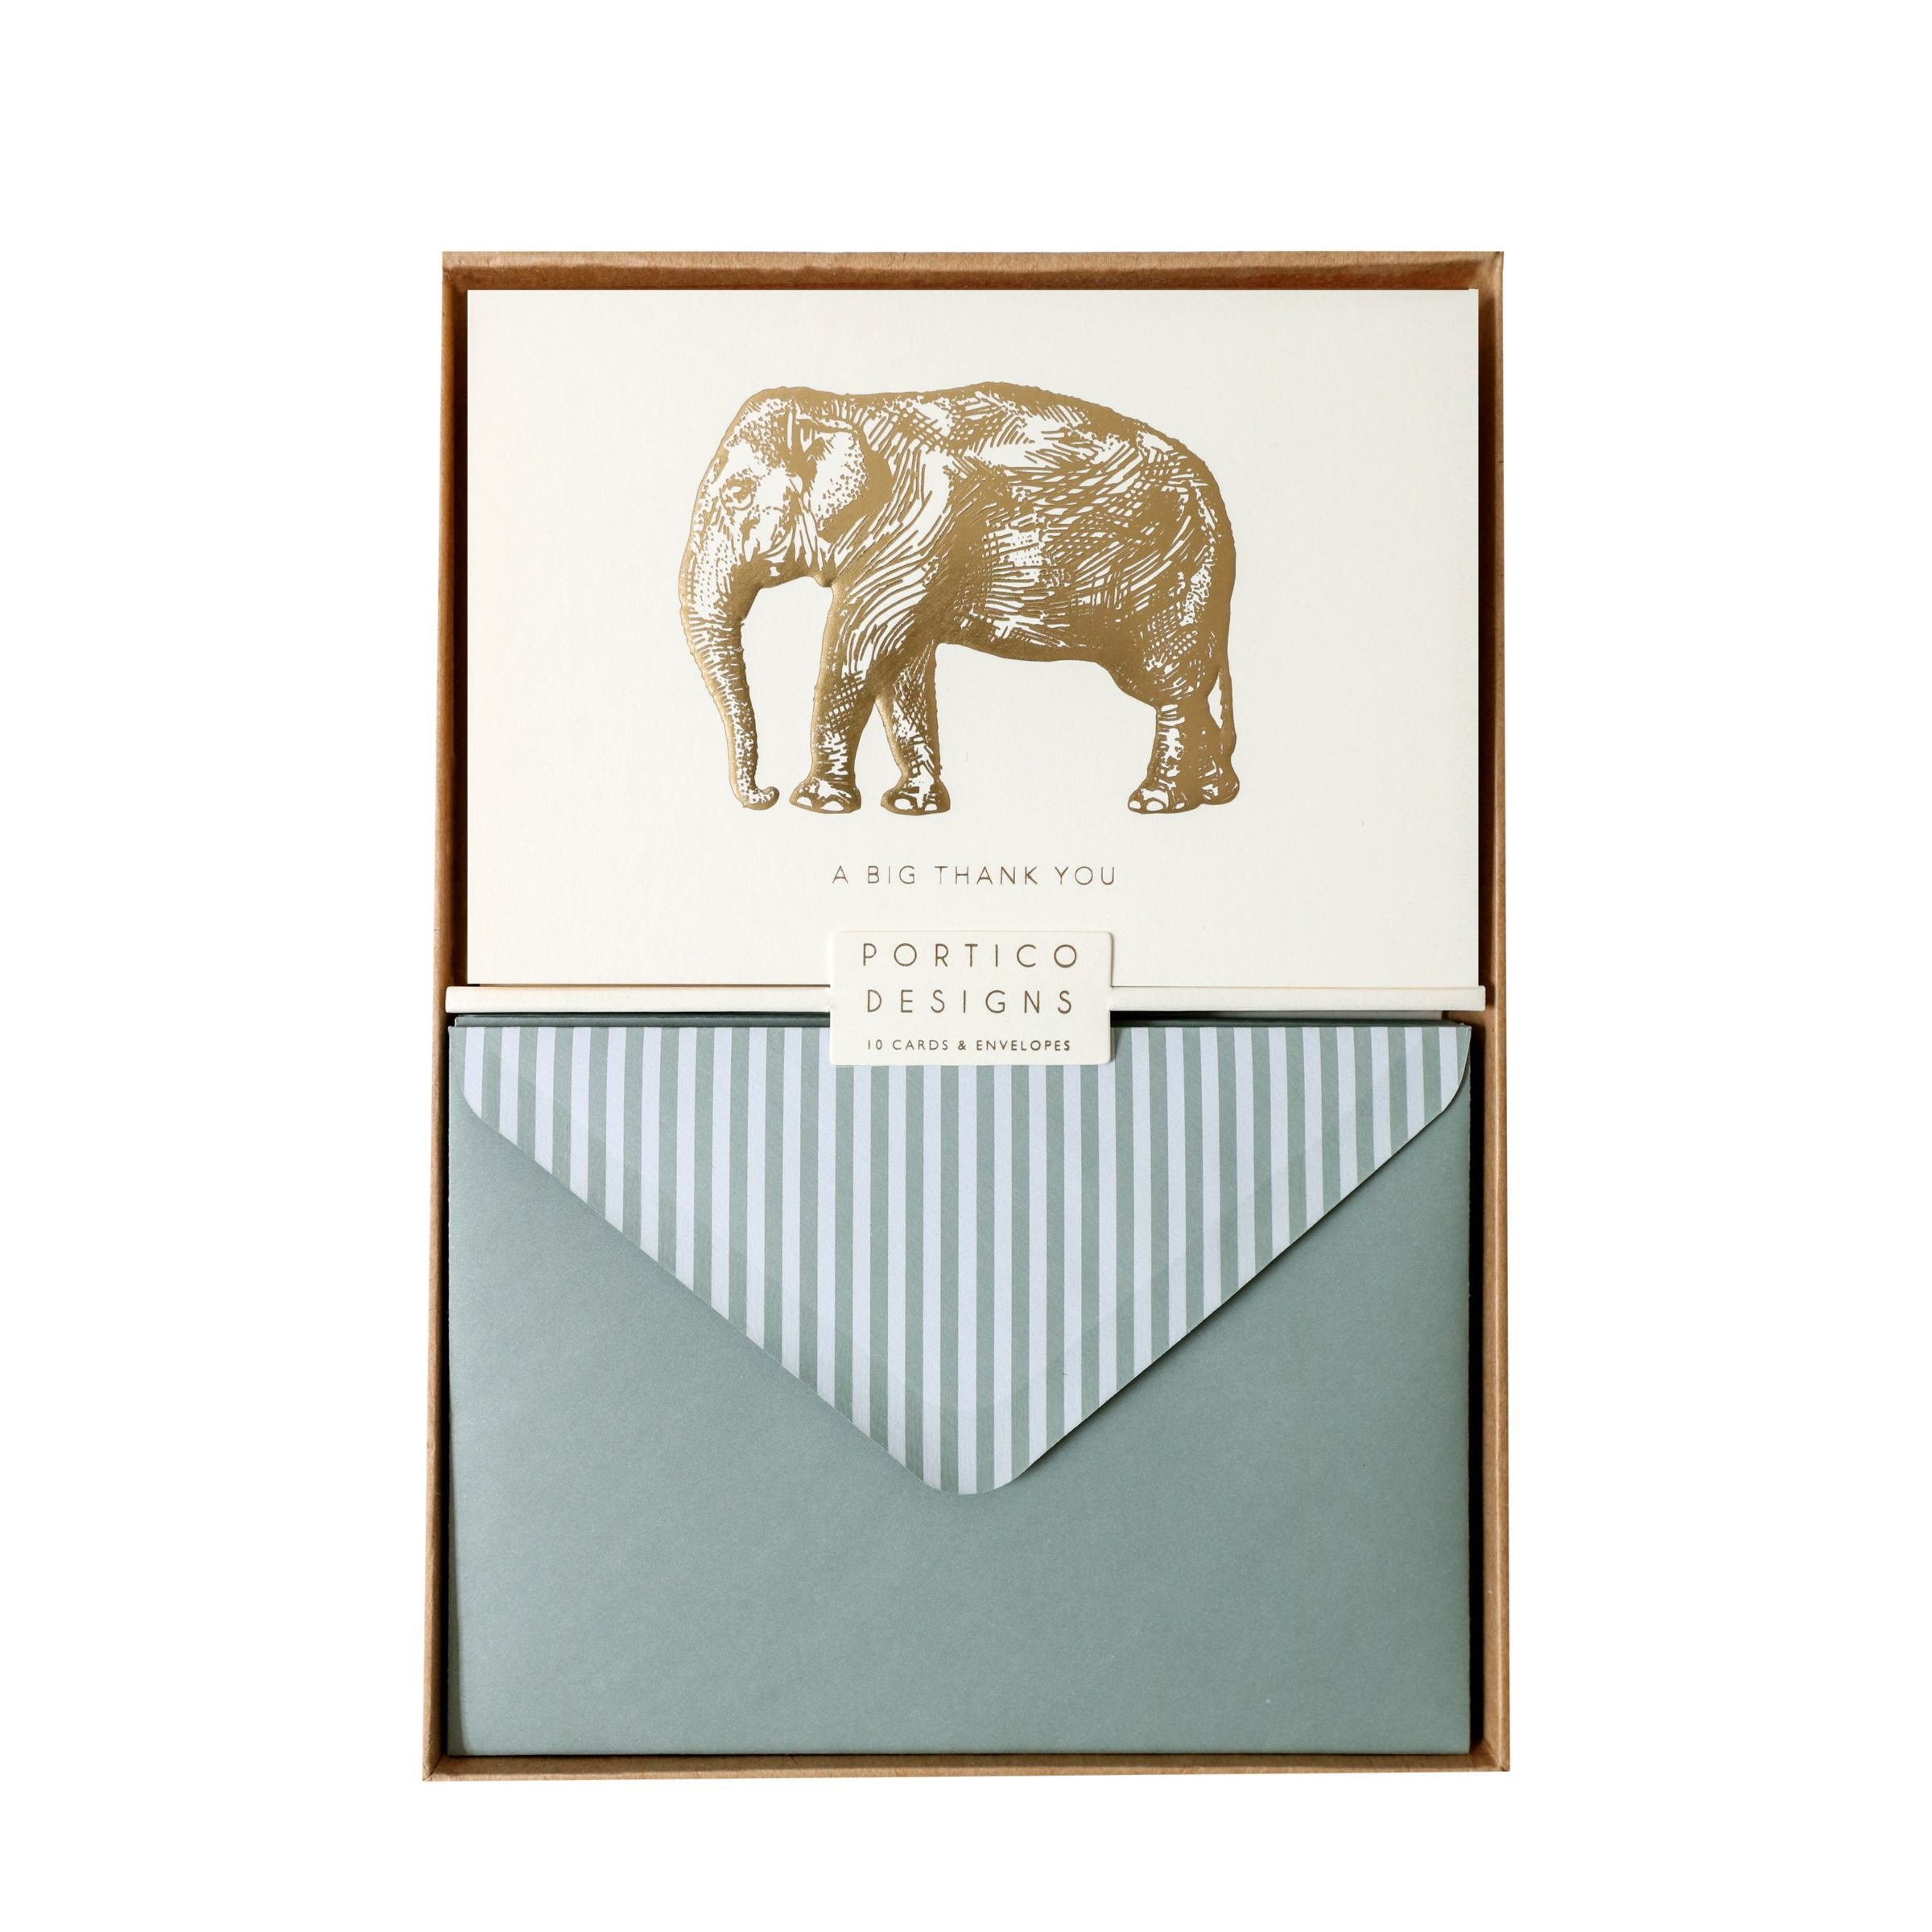 Portico Portico Elephant Thank You Notecards, Box of 10